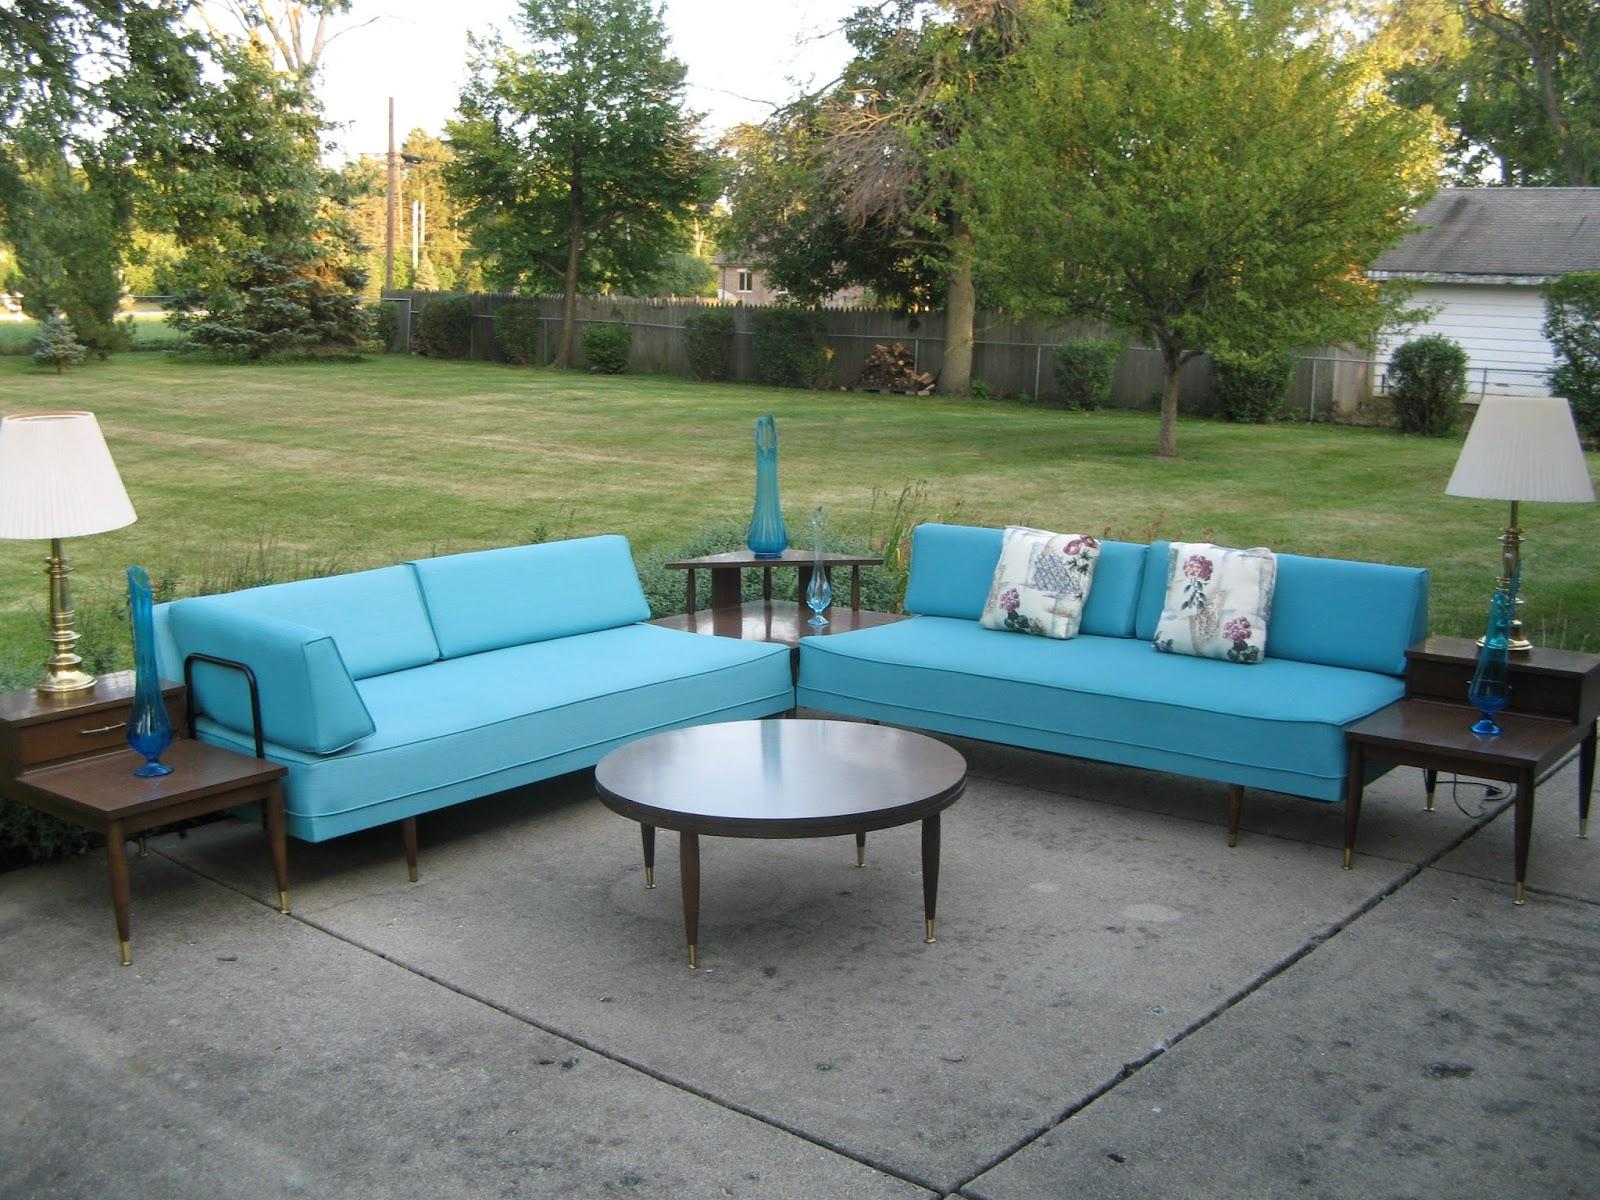 MidCenturyModernManiagmailcom Ss Turquoise Aqua Brilliant - Mid century modern corner table